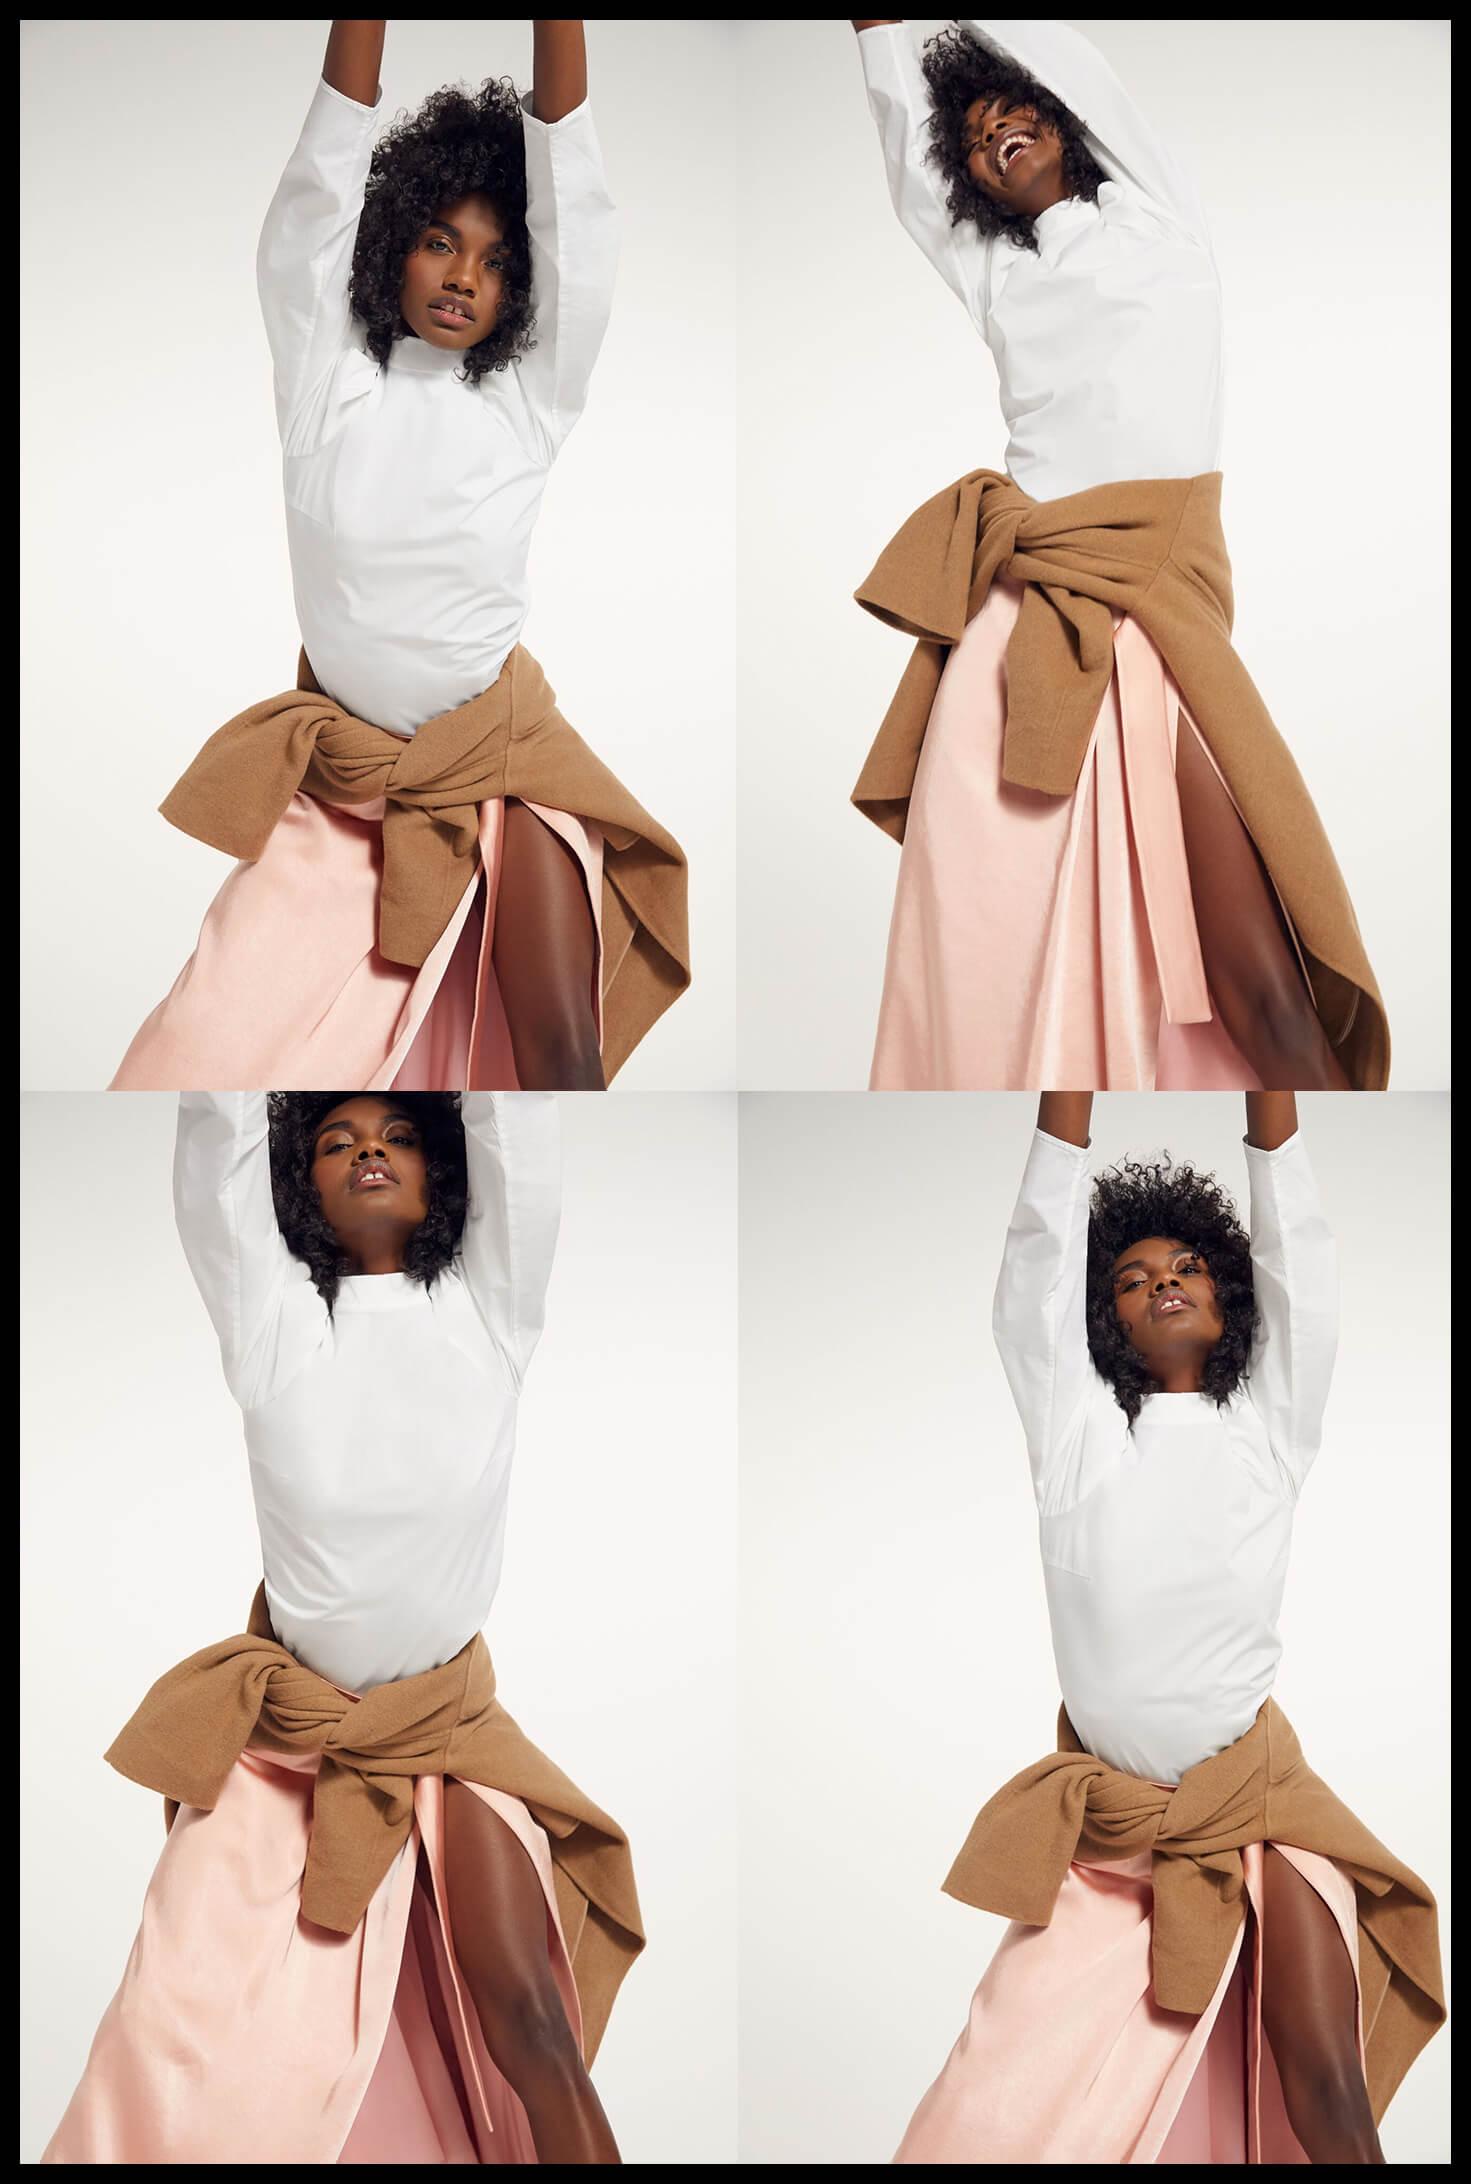 Model wearing goop REJINA PYO blouse